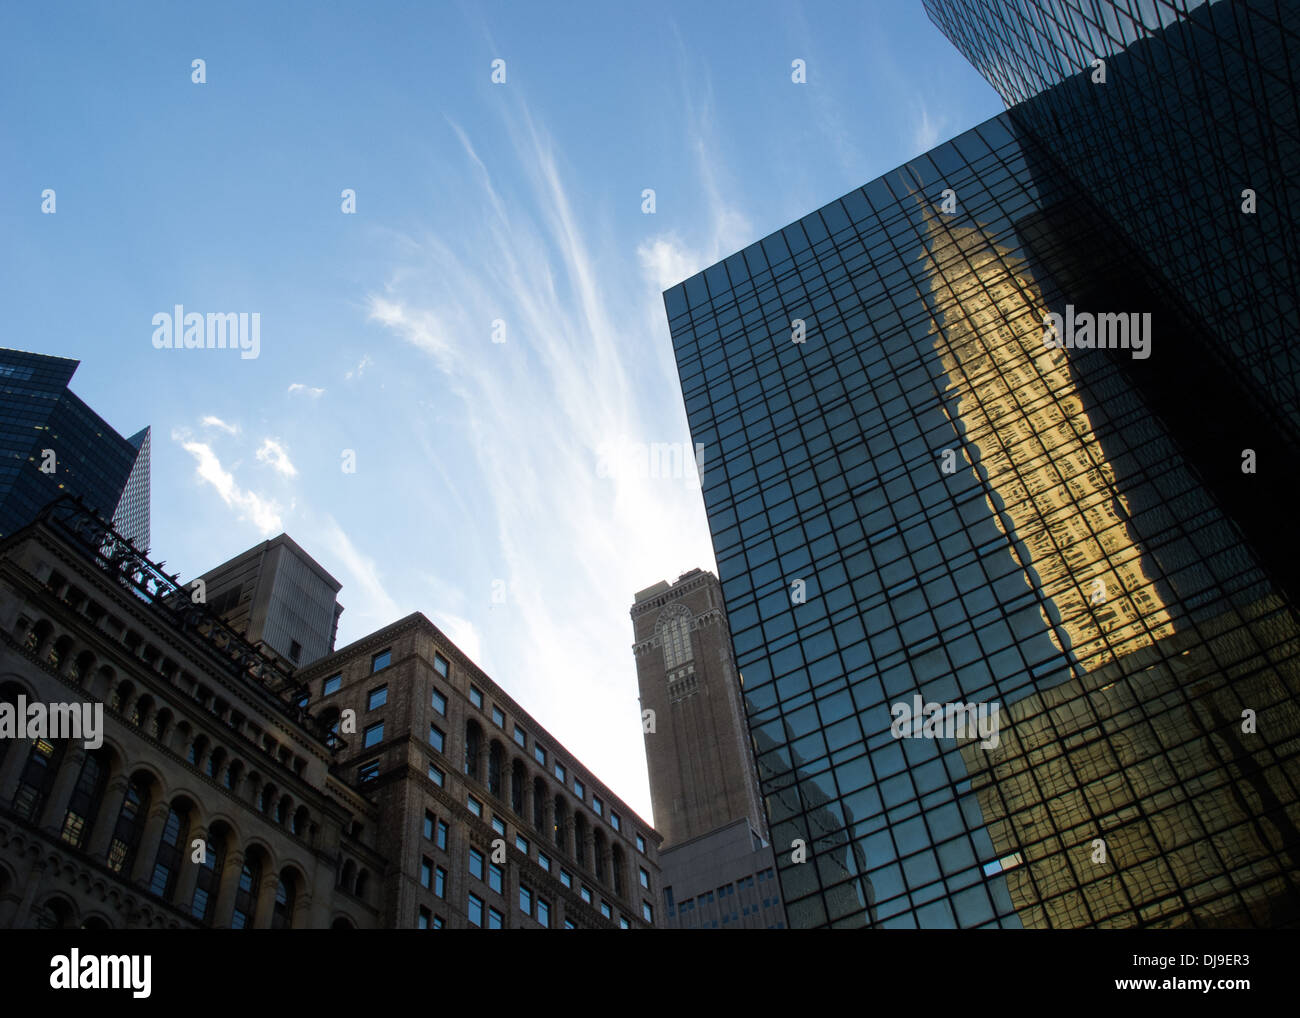 Glass facade with reflection of Chrysler building,Manhattan,New York,USA. - Stock Image